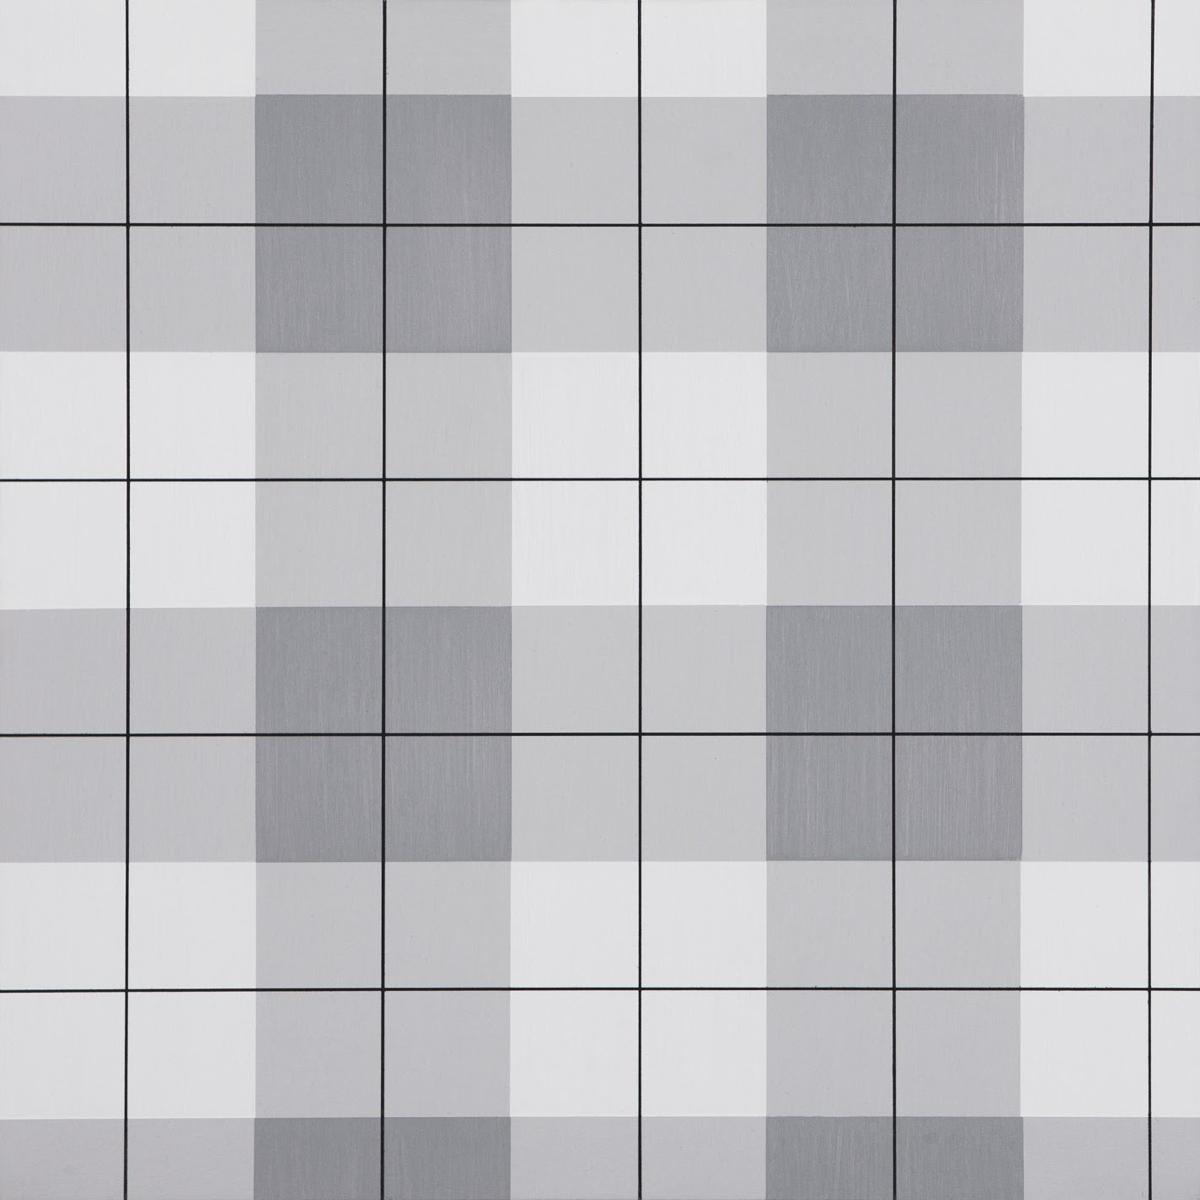 "Plaid 2, 36"" x 36"", Acrylic latex on panel, 2014"